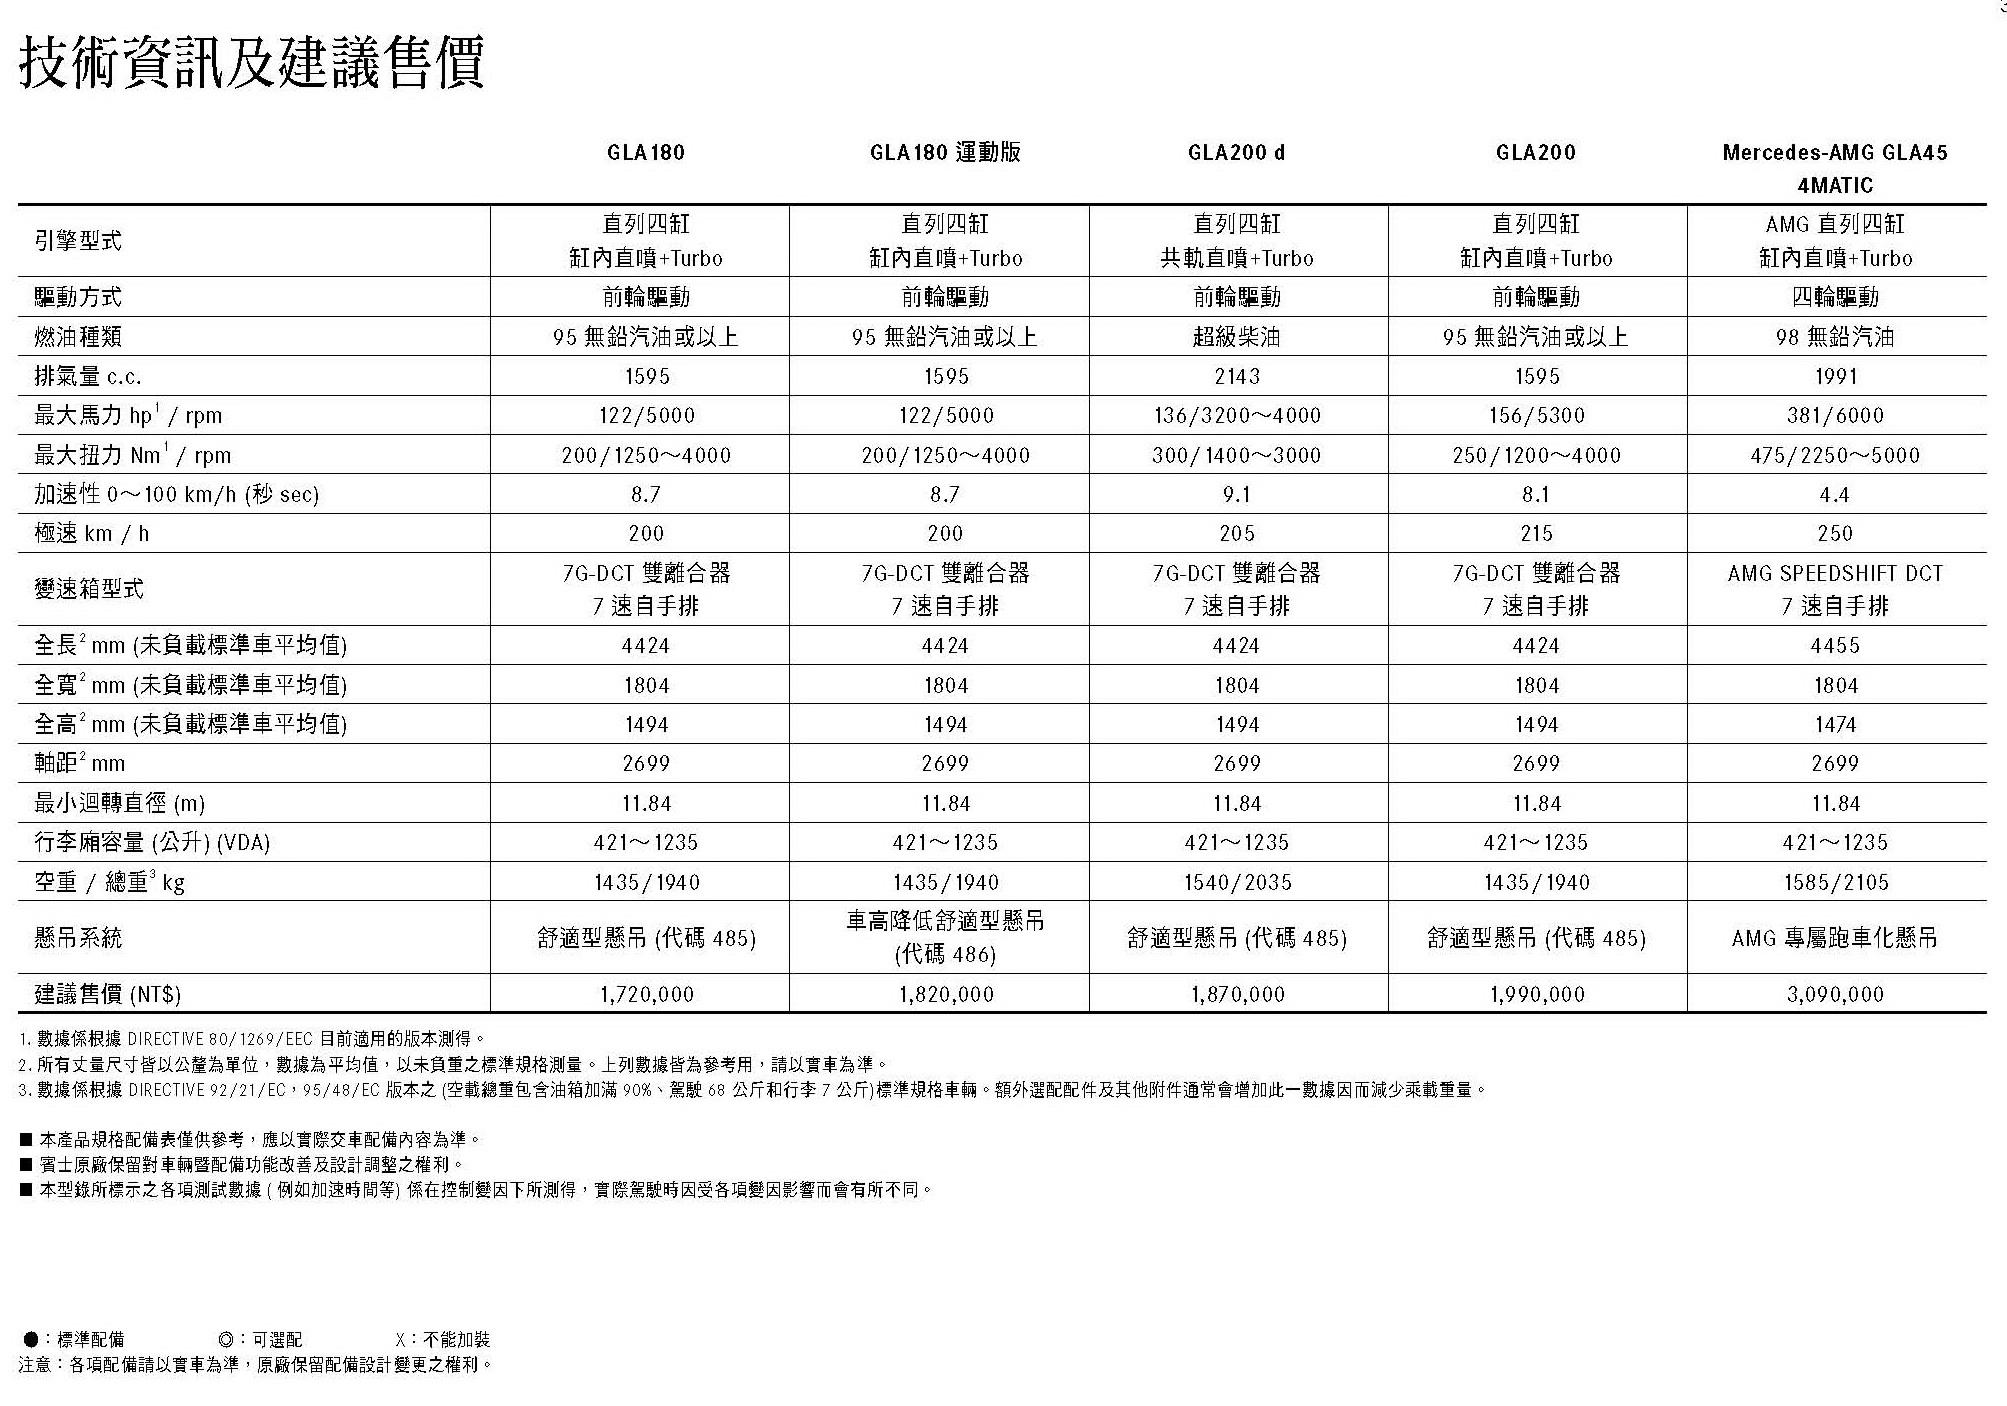 MY1718 GLA規格配備表20170510_final_頁面_03